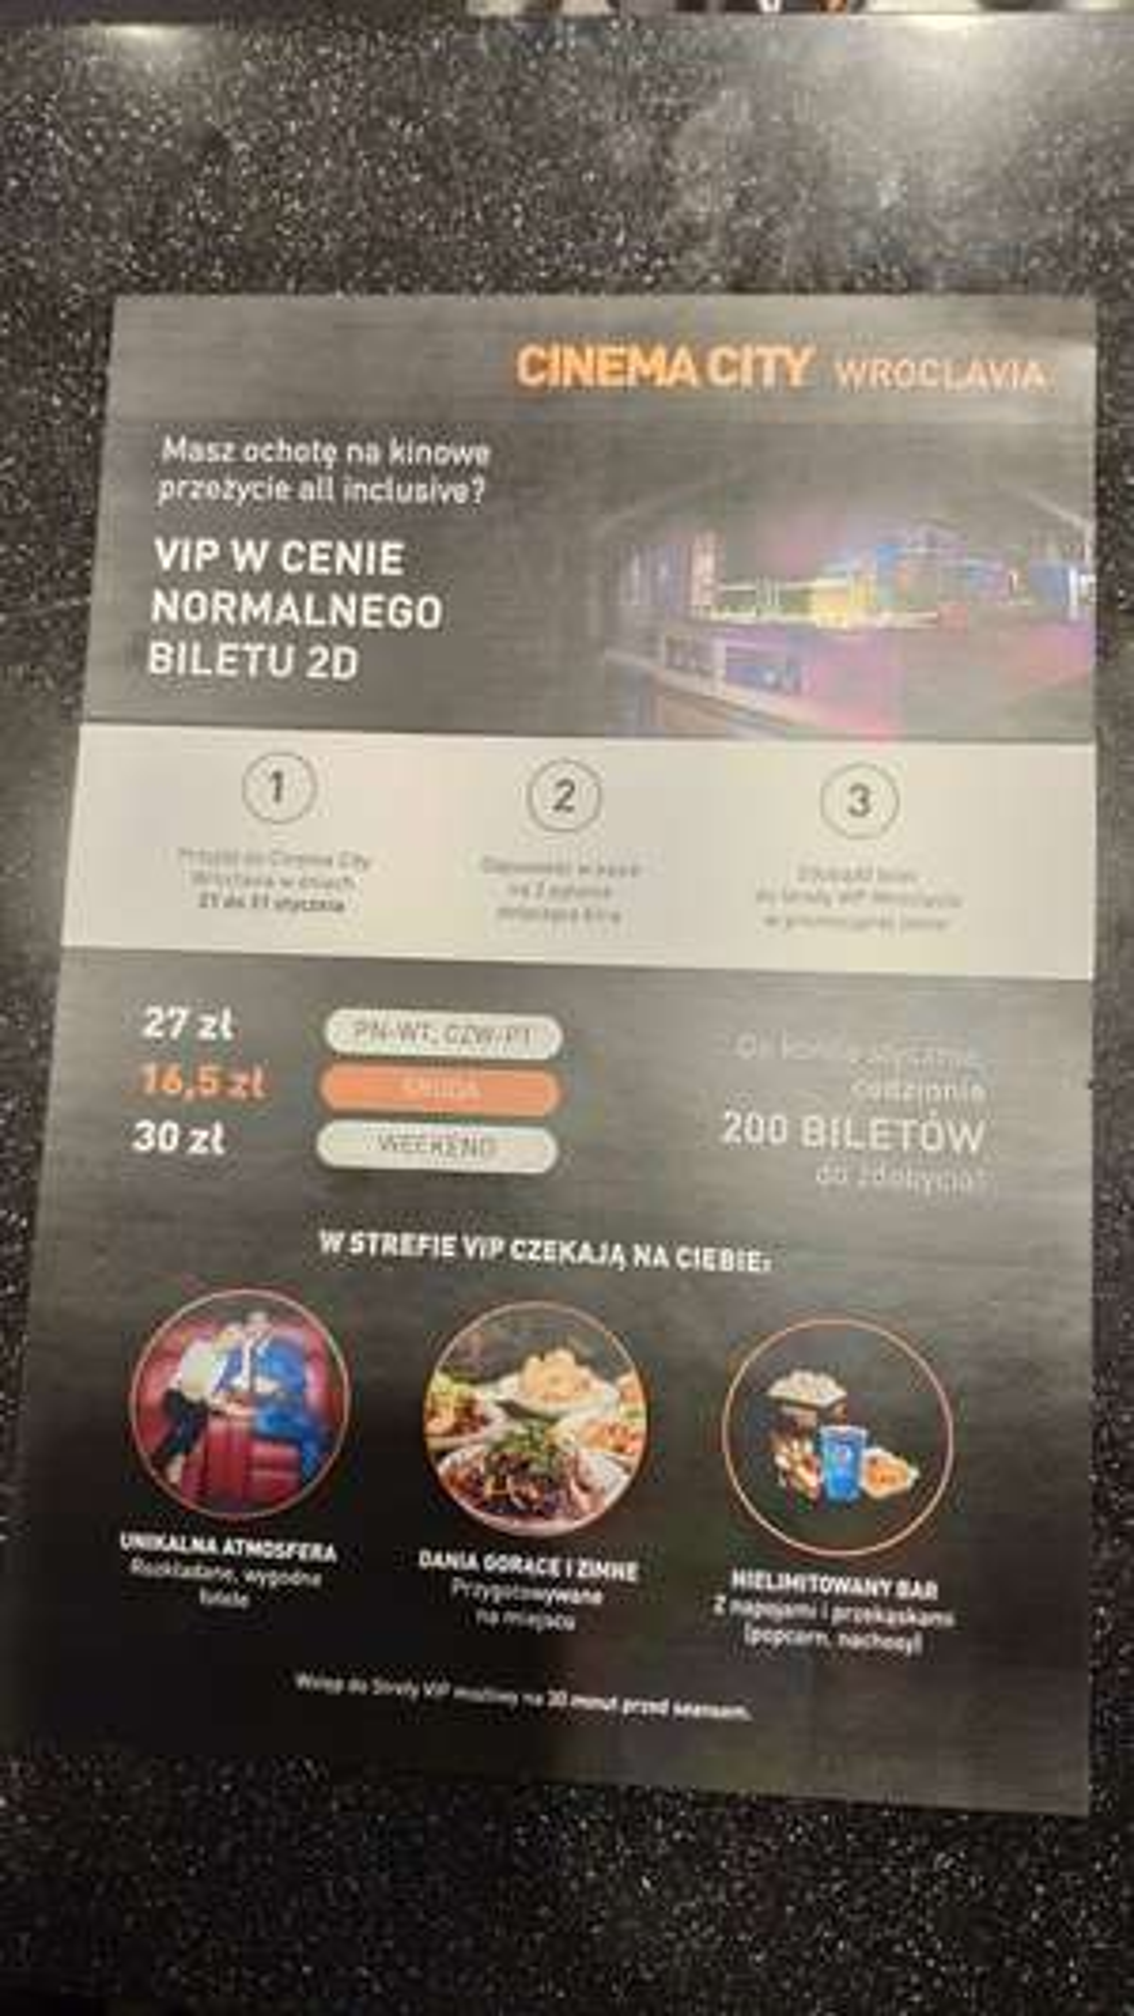 Bilety VIP CINEMA CITY ZA 30/27/16,5 ZŁ